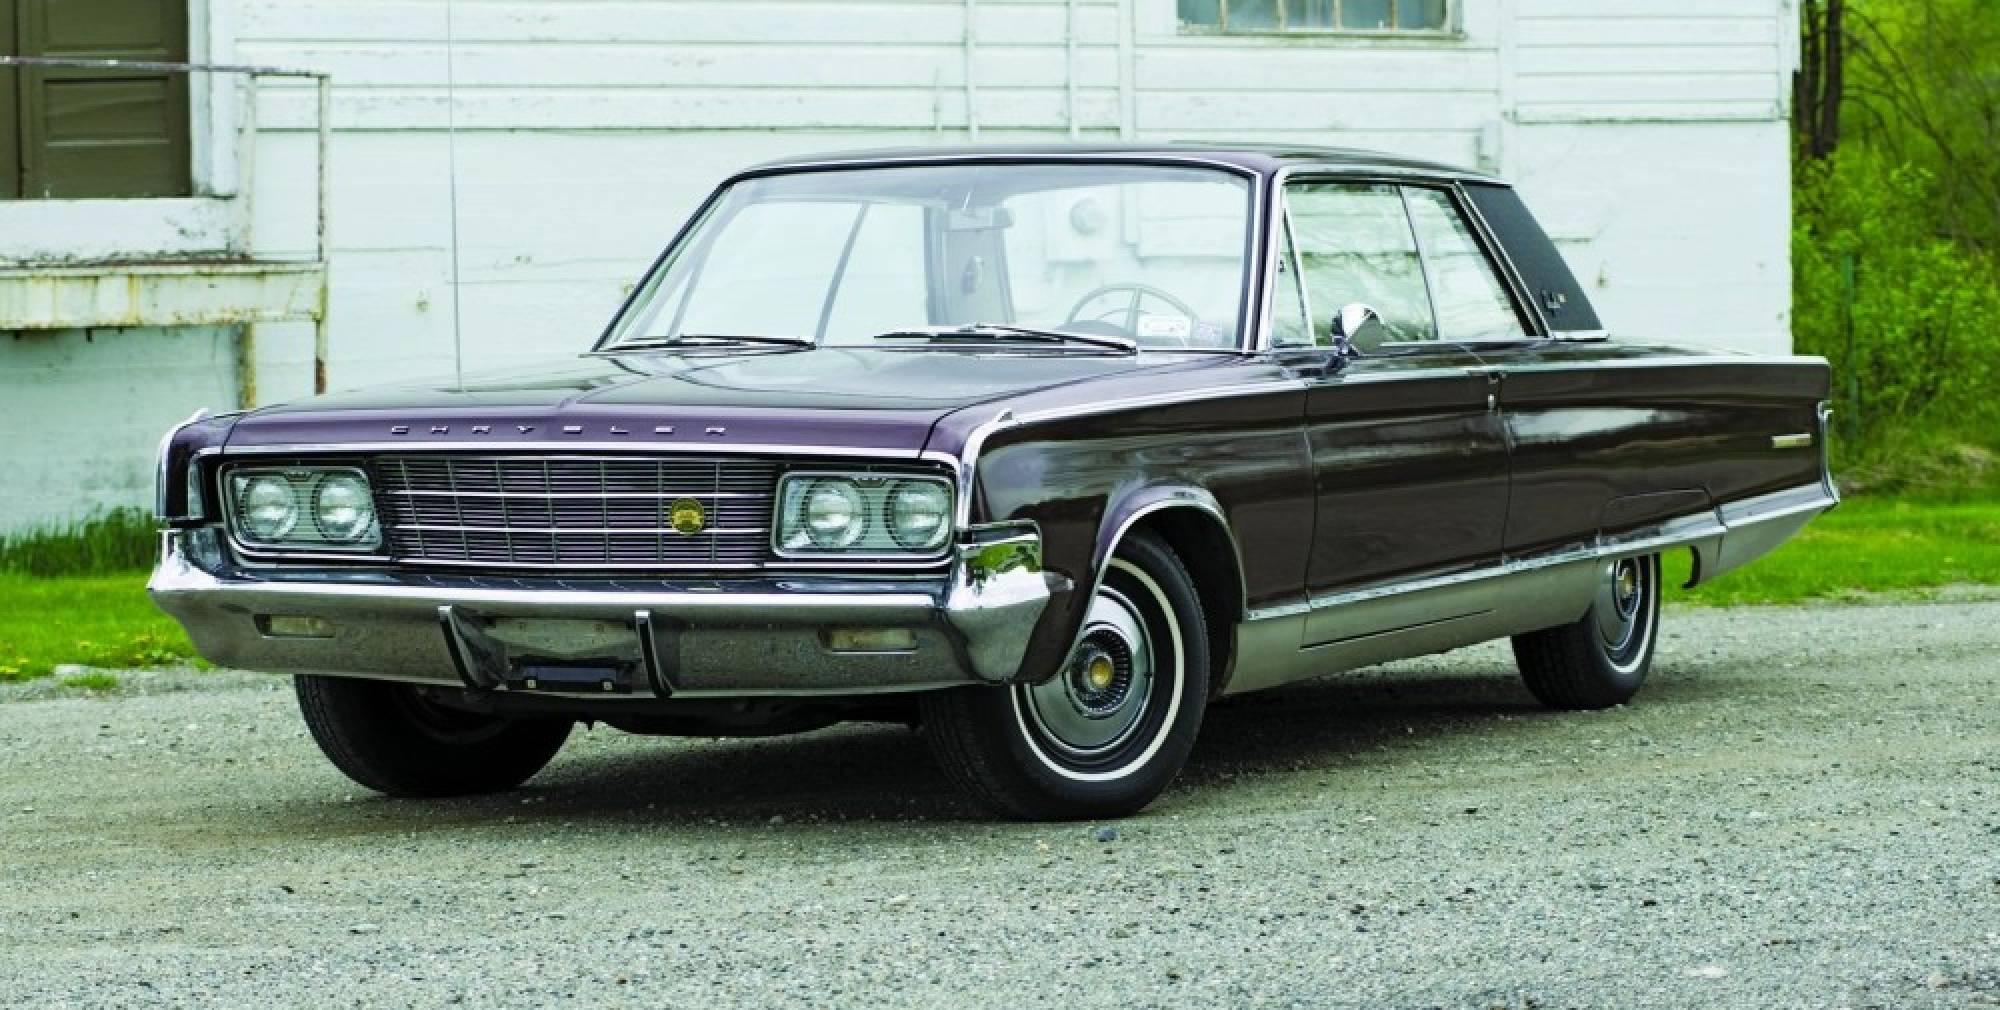 Chrysler New Yorker VII 1965 - 1968 Coupe-Hardtop #5